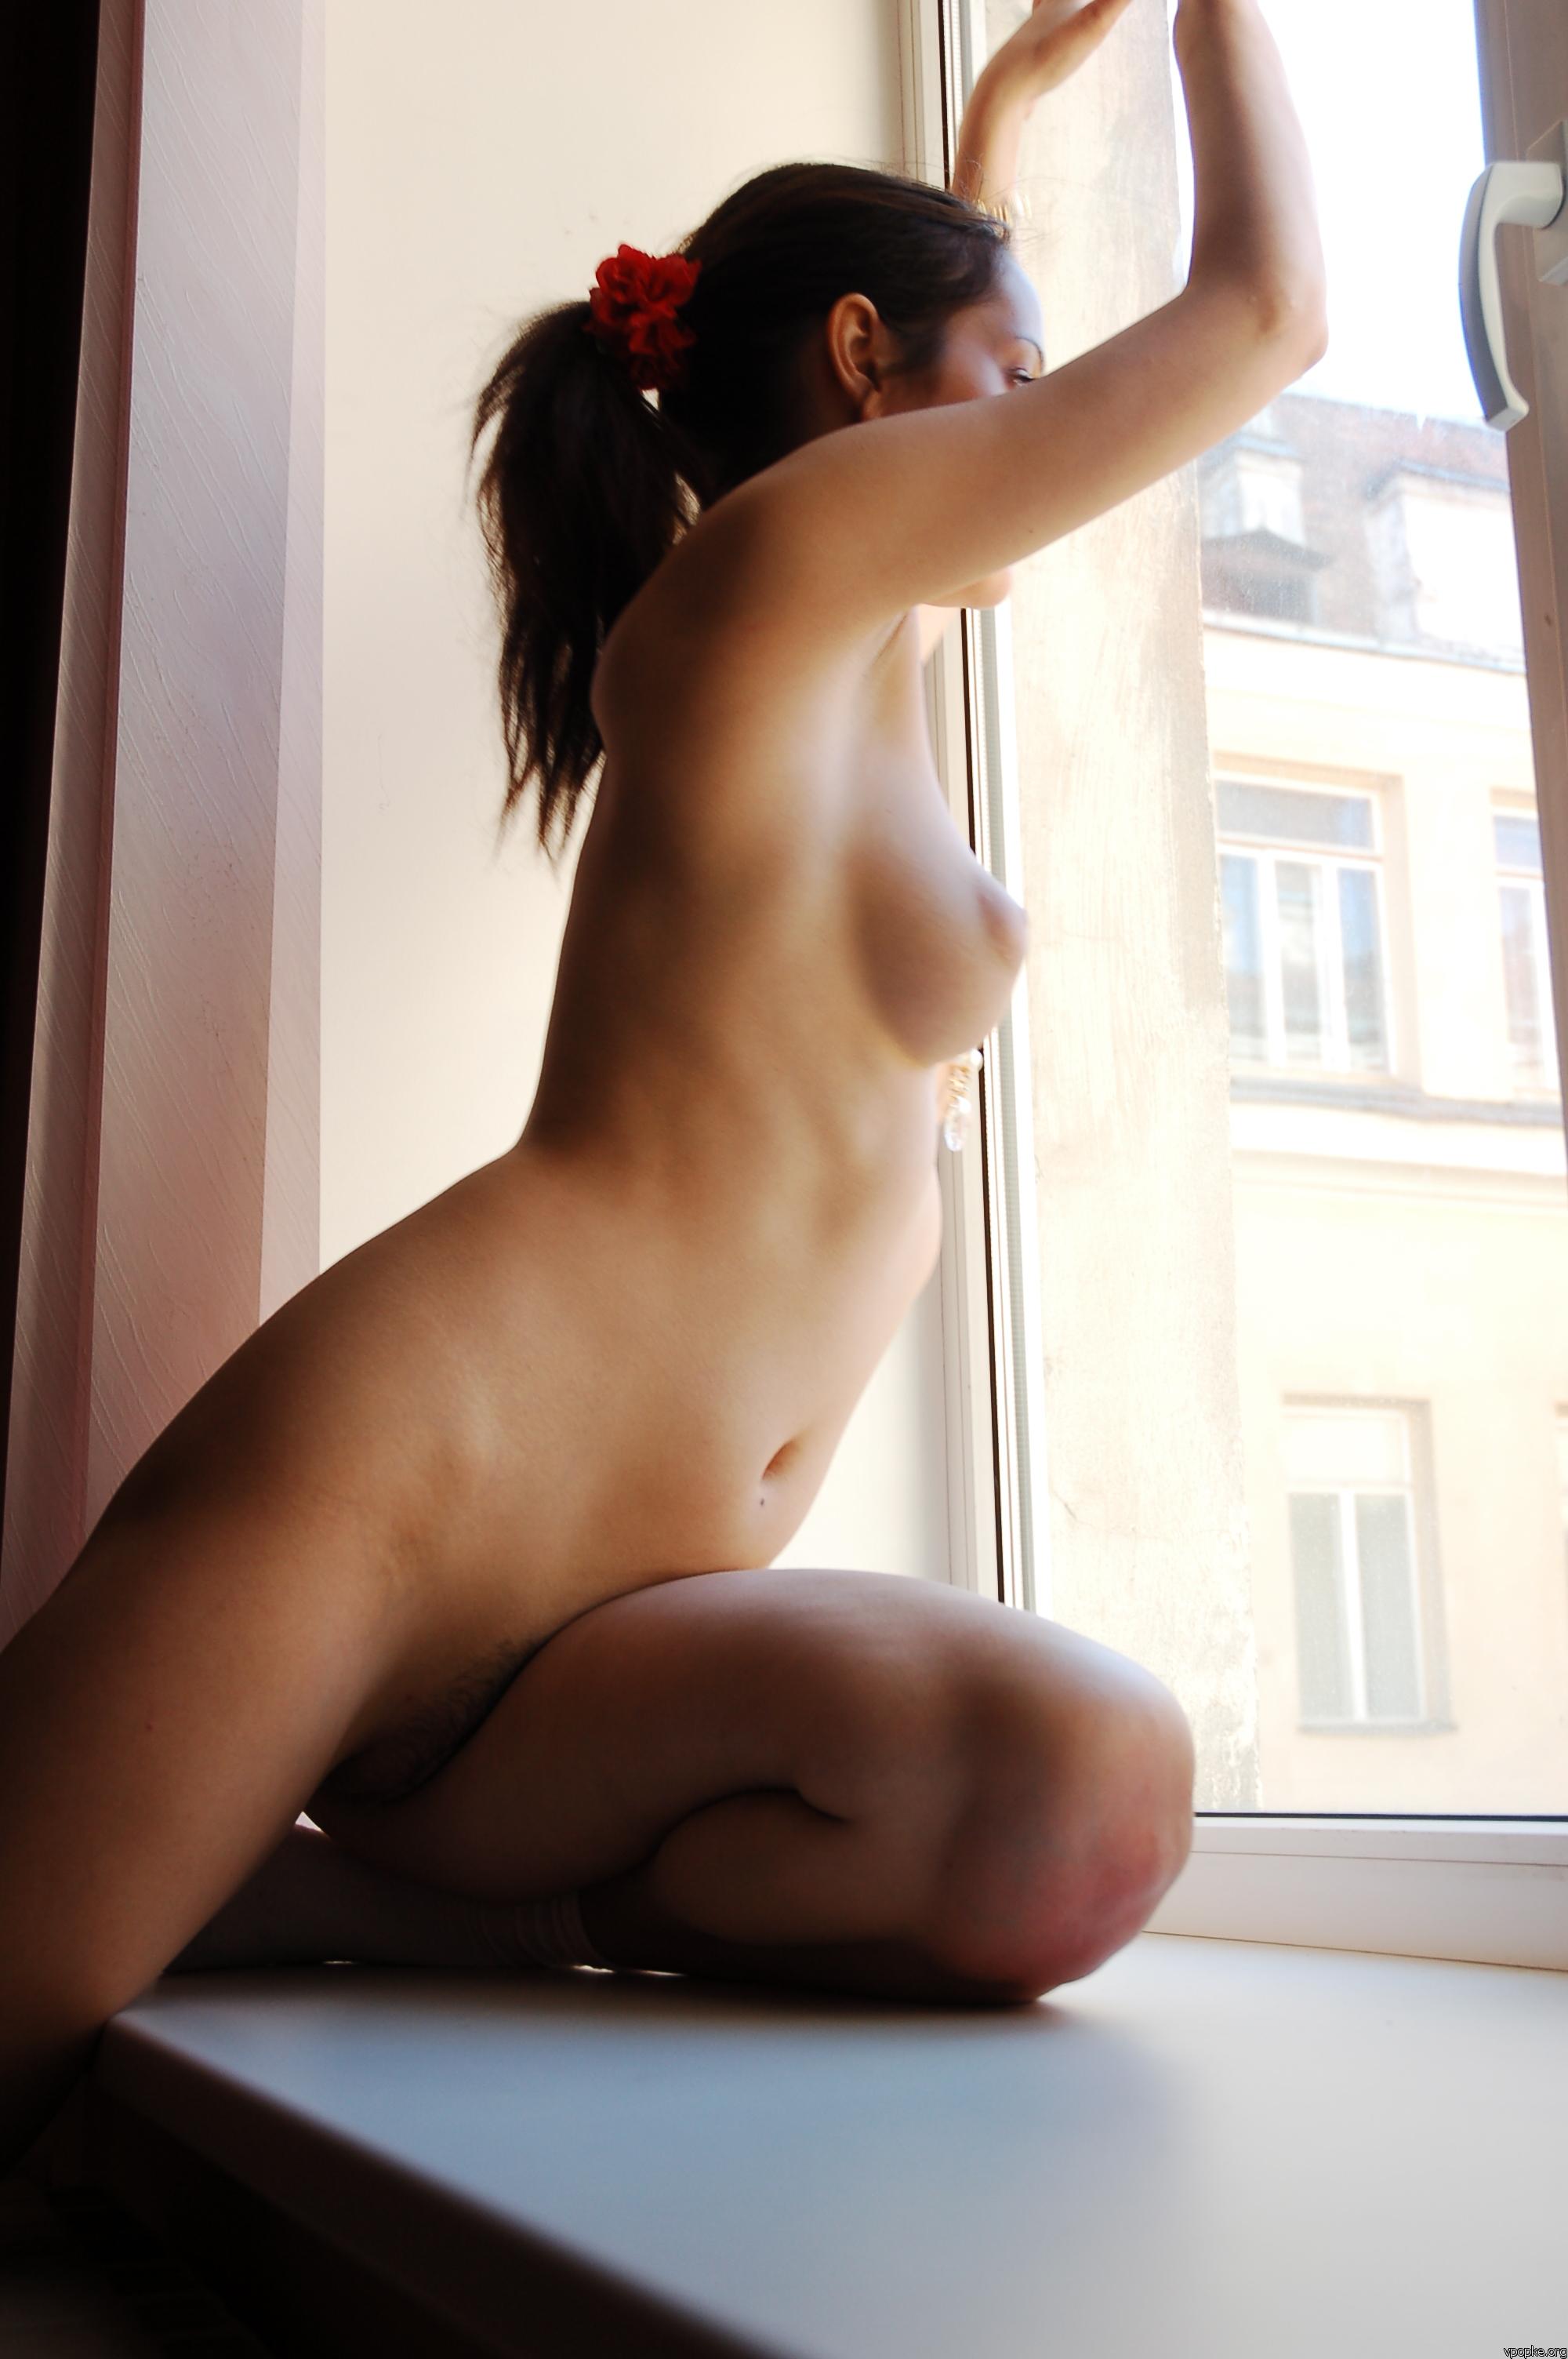 https://boobsmo.com/content/167/boobsmo_com_0000__77.jpg